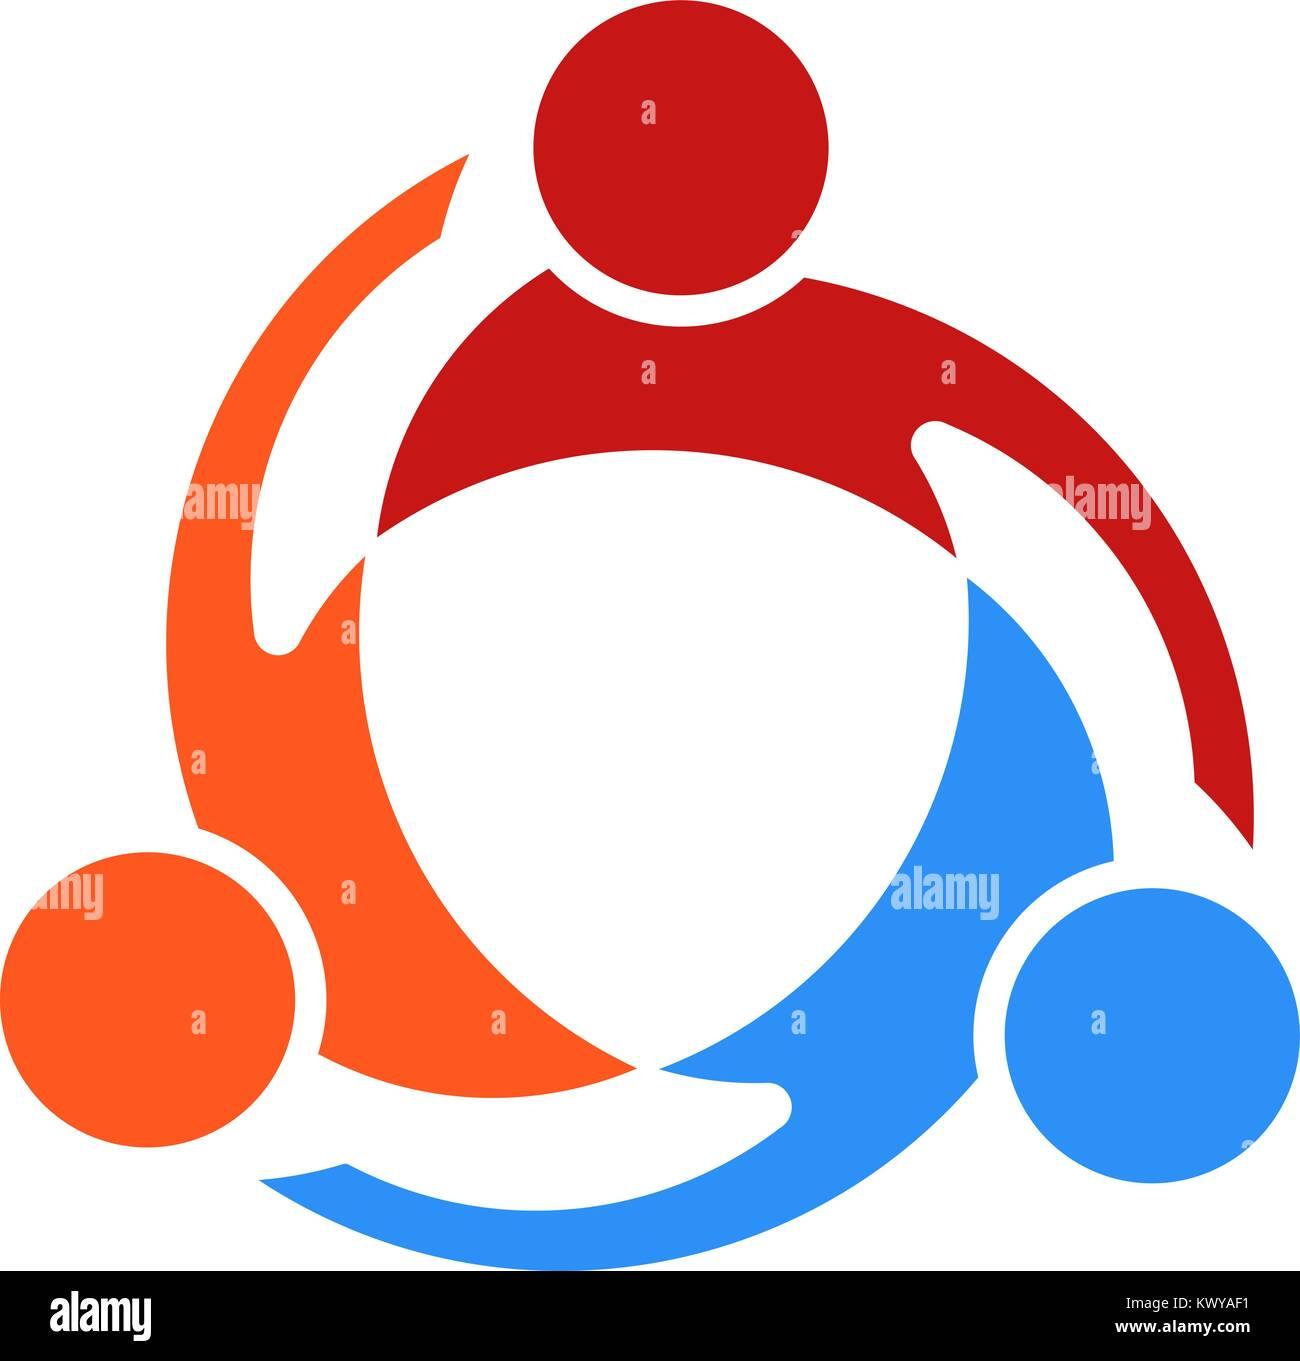 Three People Swirl Vector Logo Illustration - Stock Vector